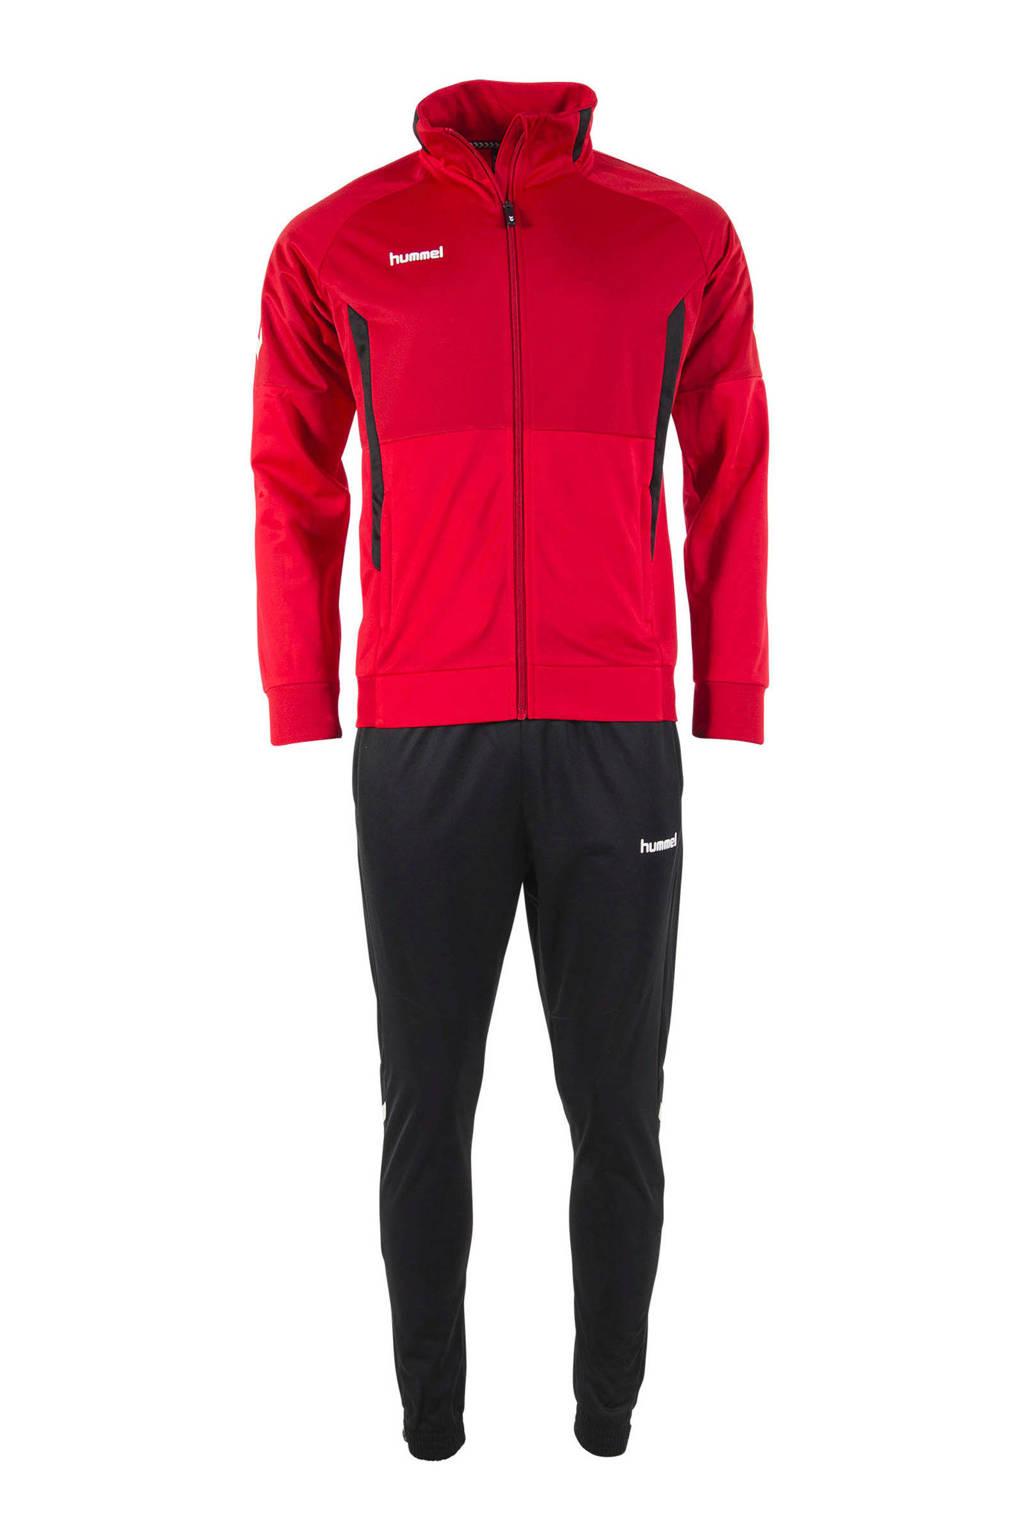 hummel Junior  trainingspak rood/zwart, Rood/zwart